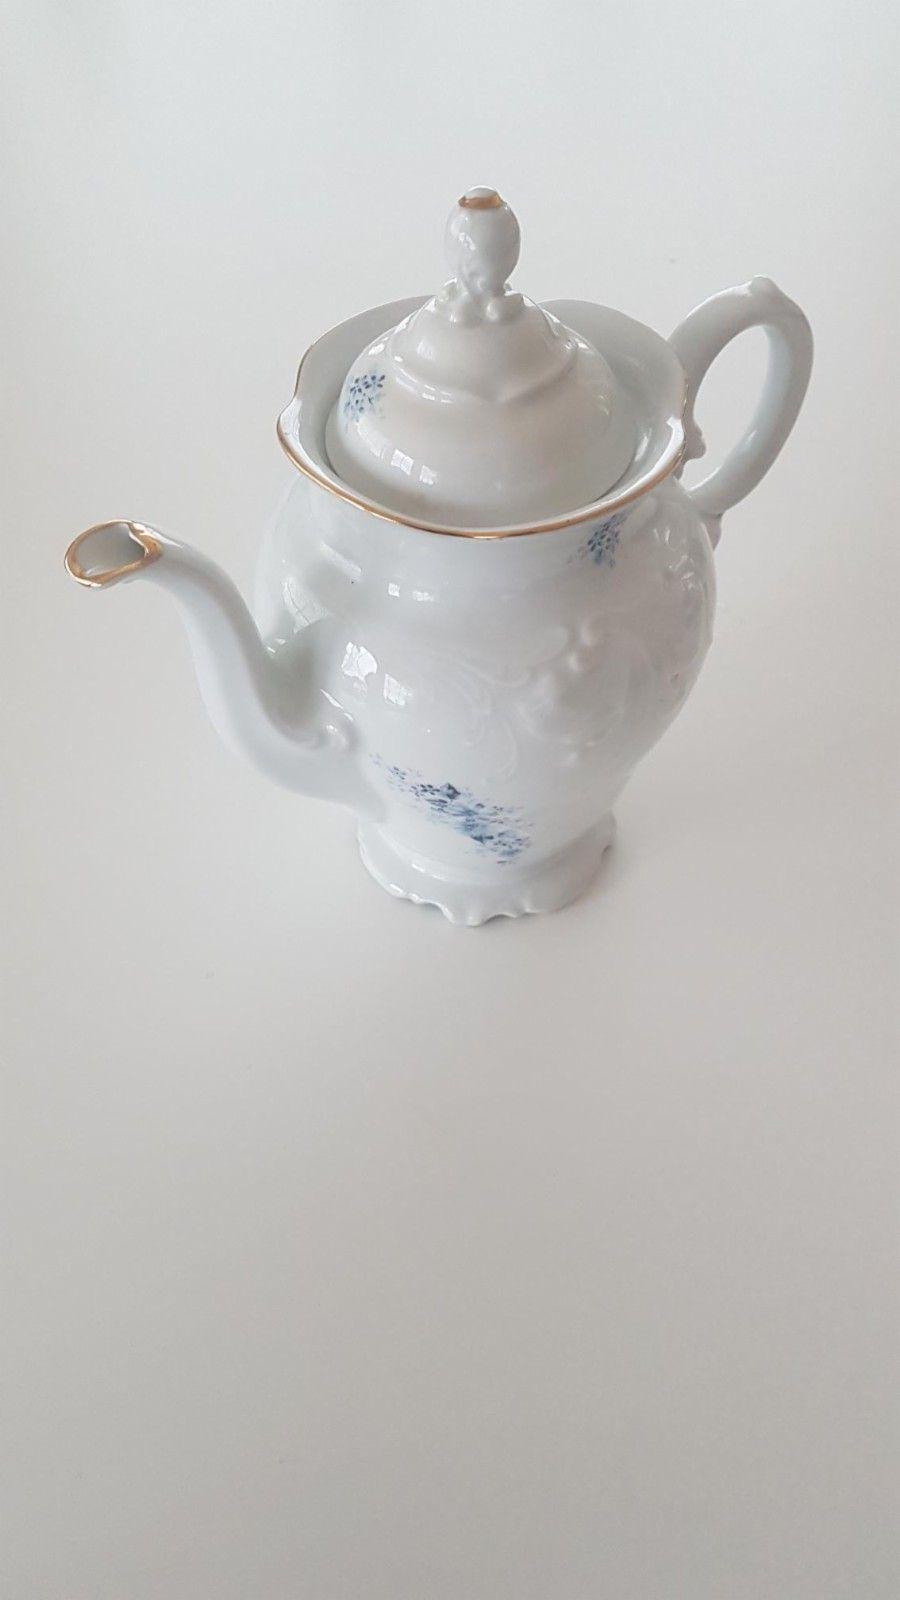 Kaffekanne - Drammen  - Antikk kaffekanne, ca. 23 cm høy - Drammen